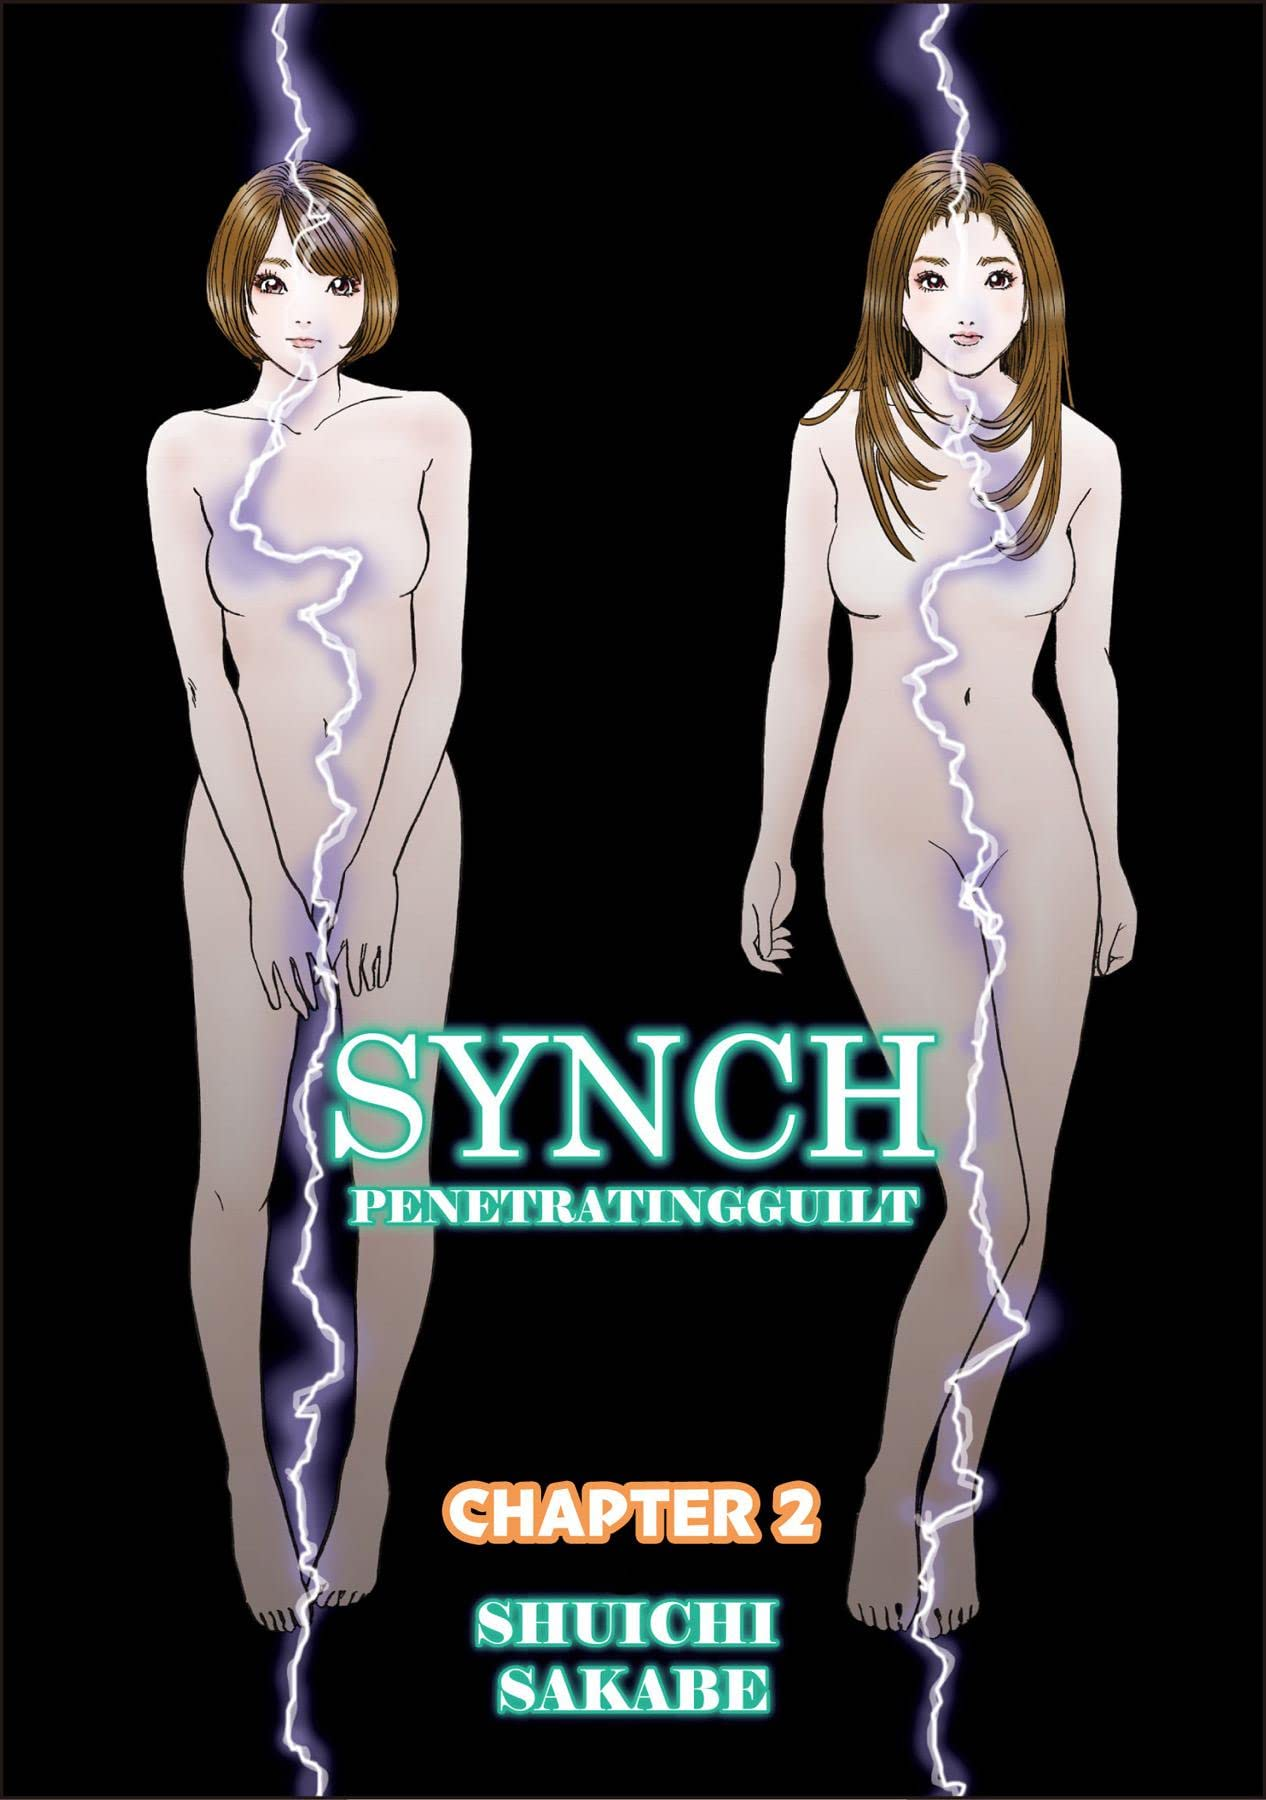 SYNCH #2